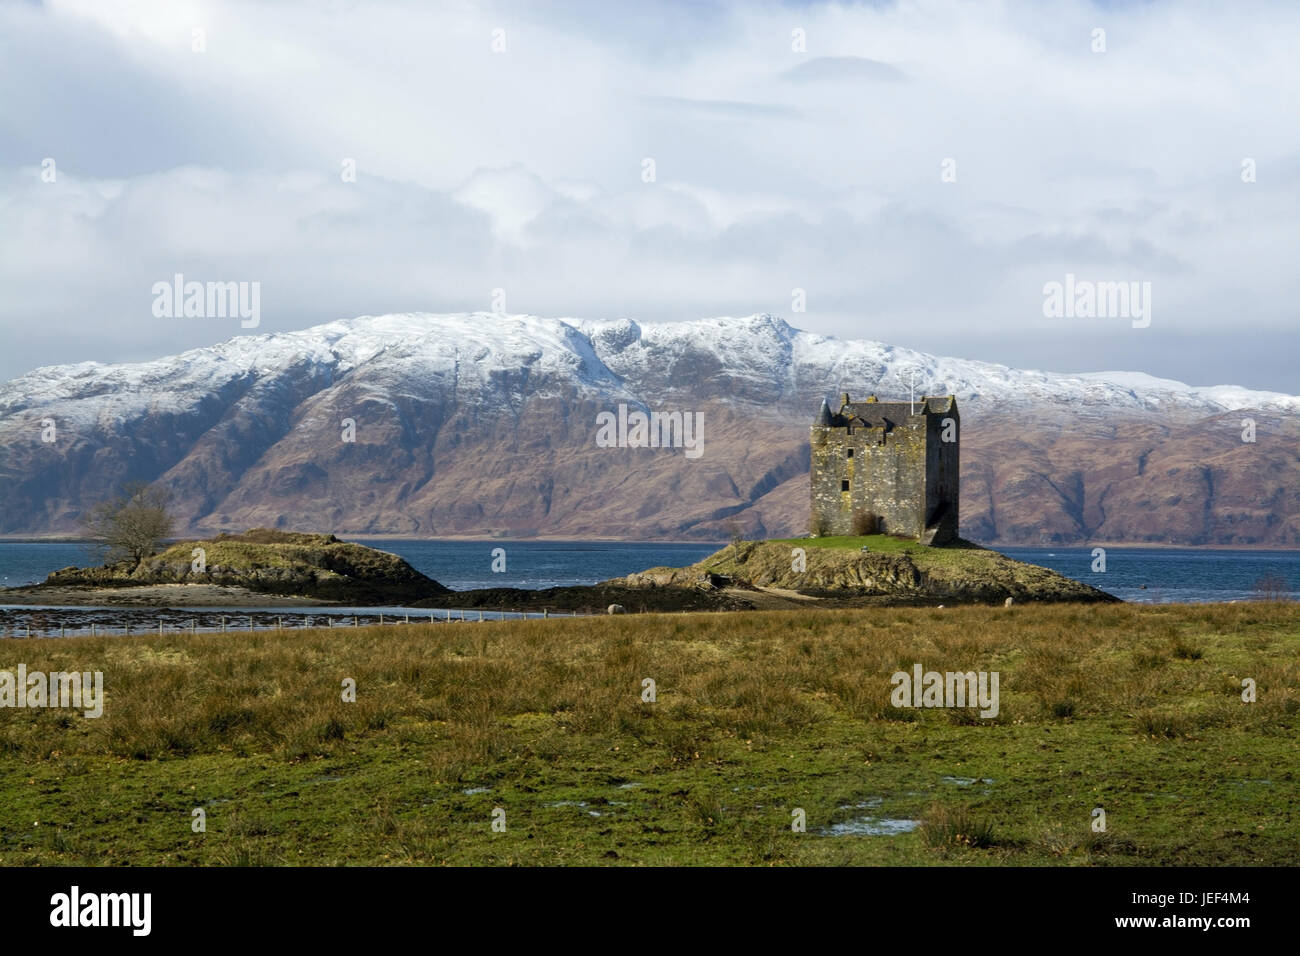 Castle Stalker in port Appin, Scotland, accepted in the Fabruar., Castle Stalker in Port Appin, Schottland, aufgenommen - Stock Image